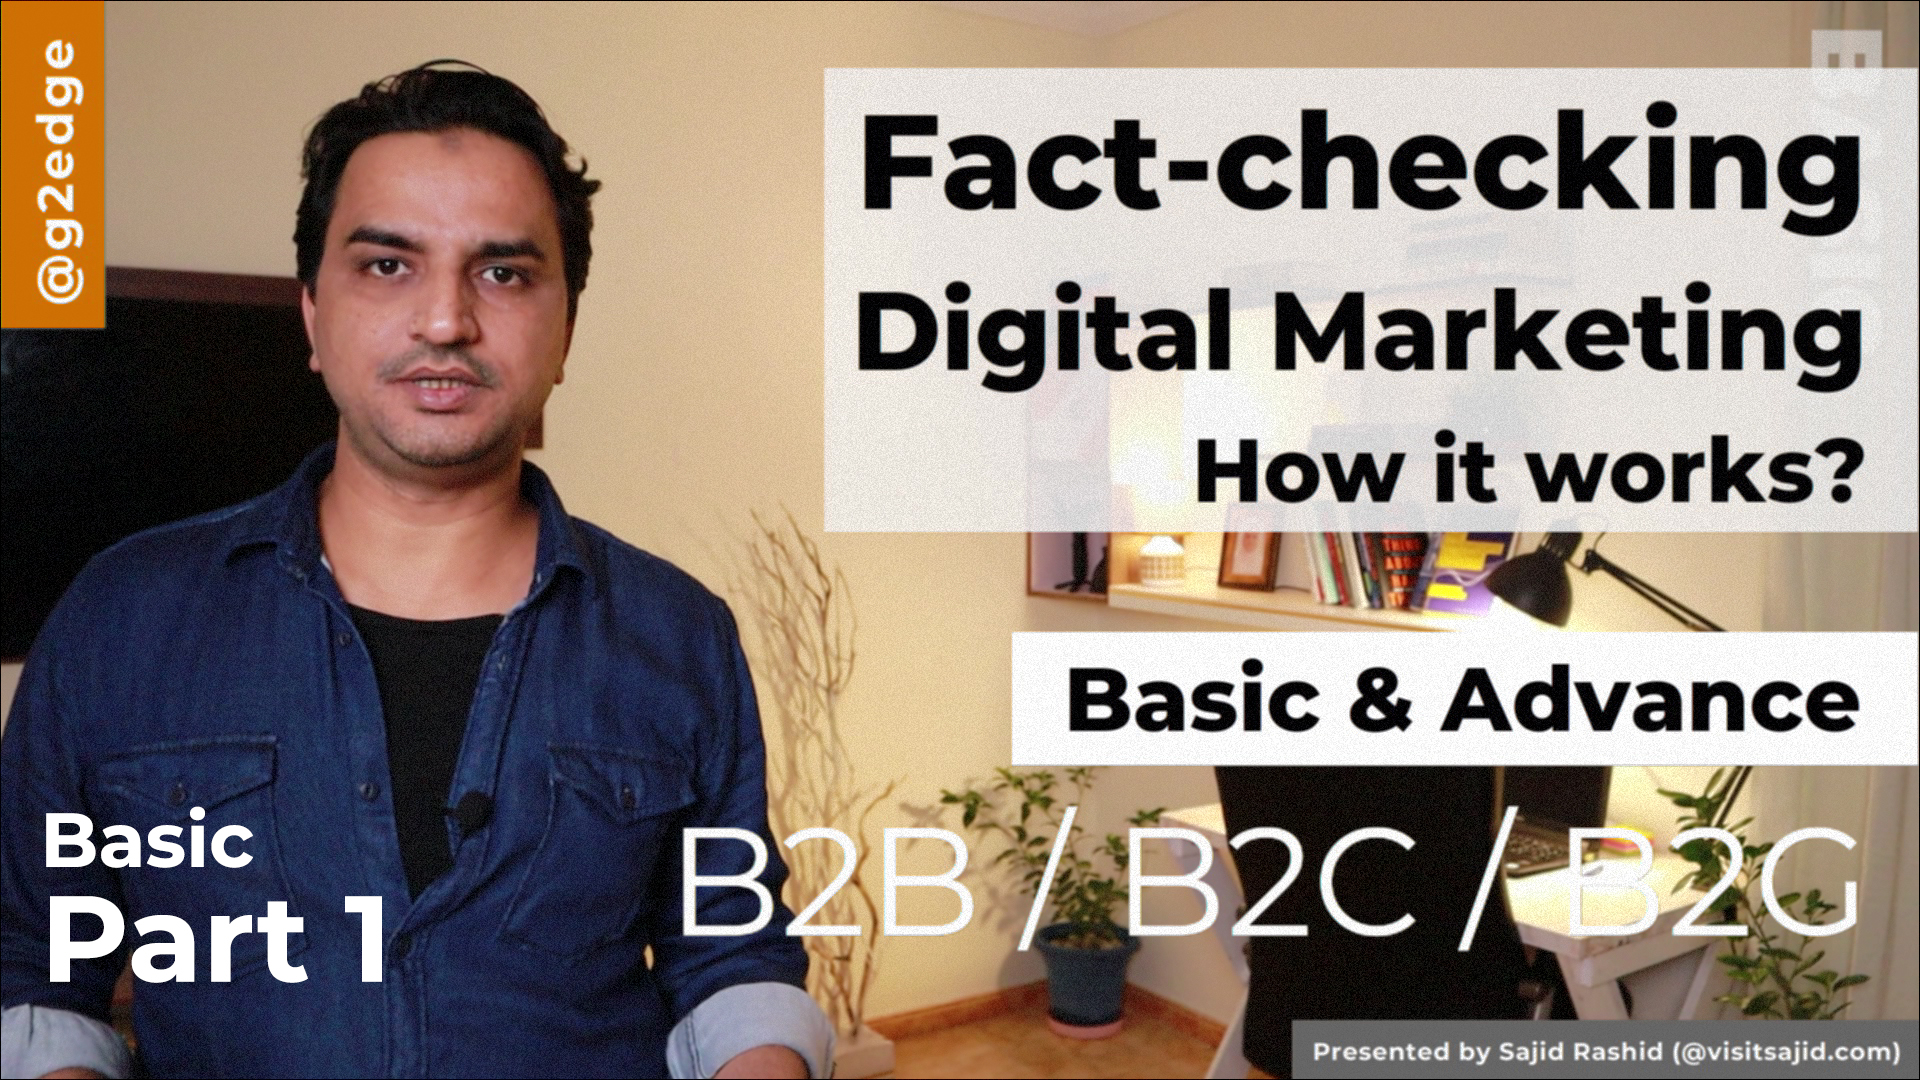 Fact-checking Digital Marketing Basic